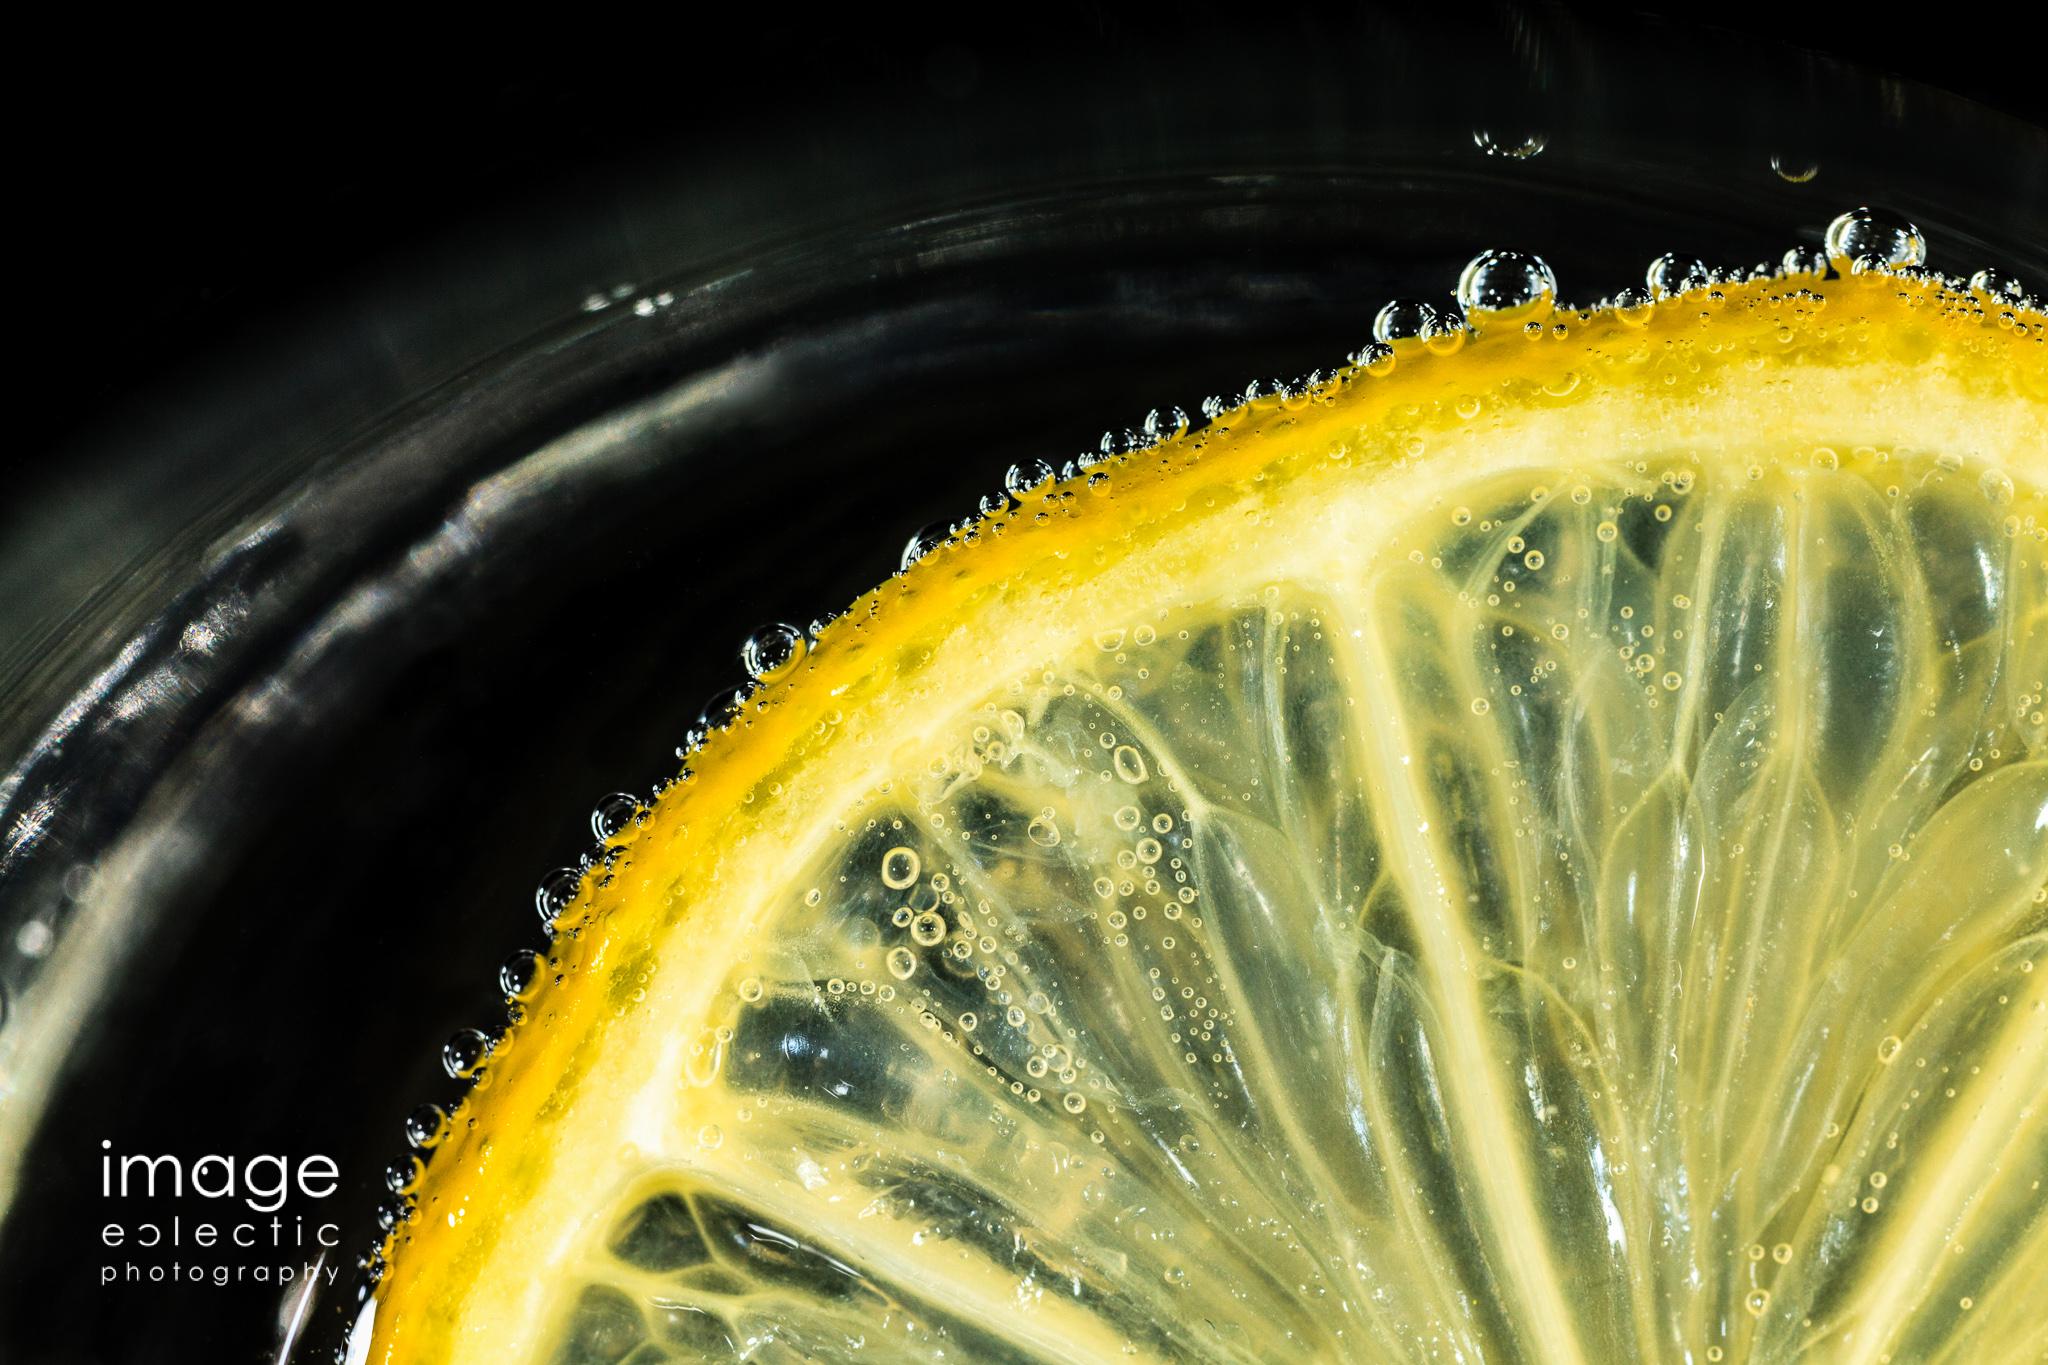 Fuzzy Lemon